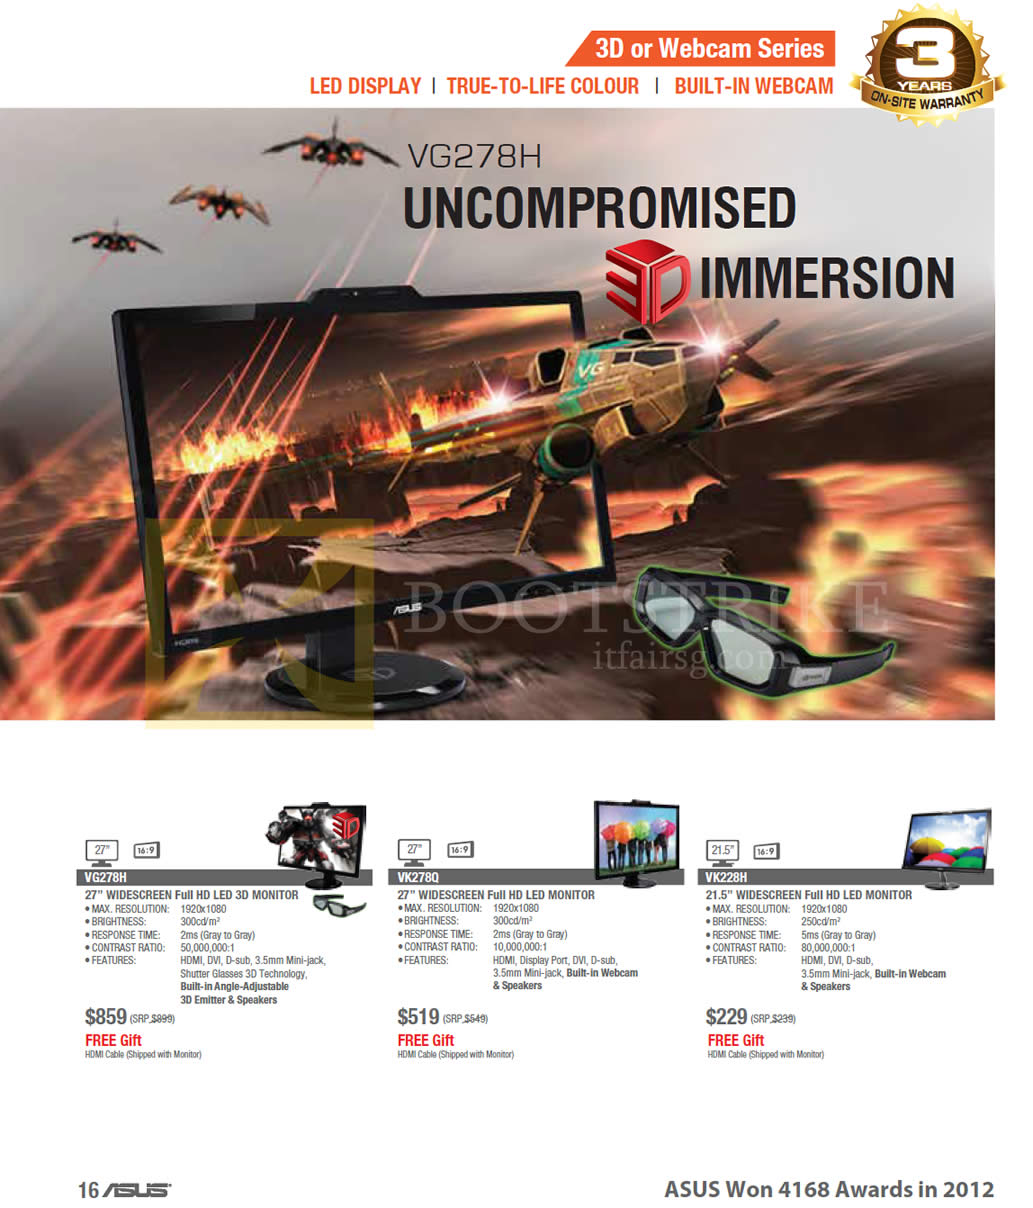 COMEX 2013 price list image brochure of ASUS Monitors 3D Or Webcam Series VG278H, VK278Q, VK228H